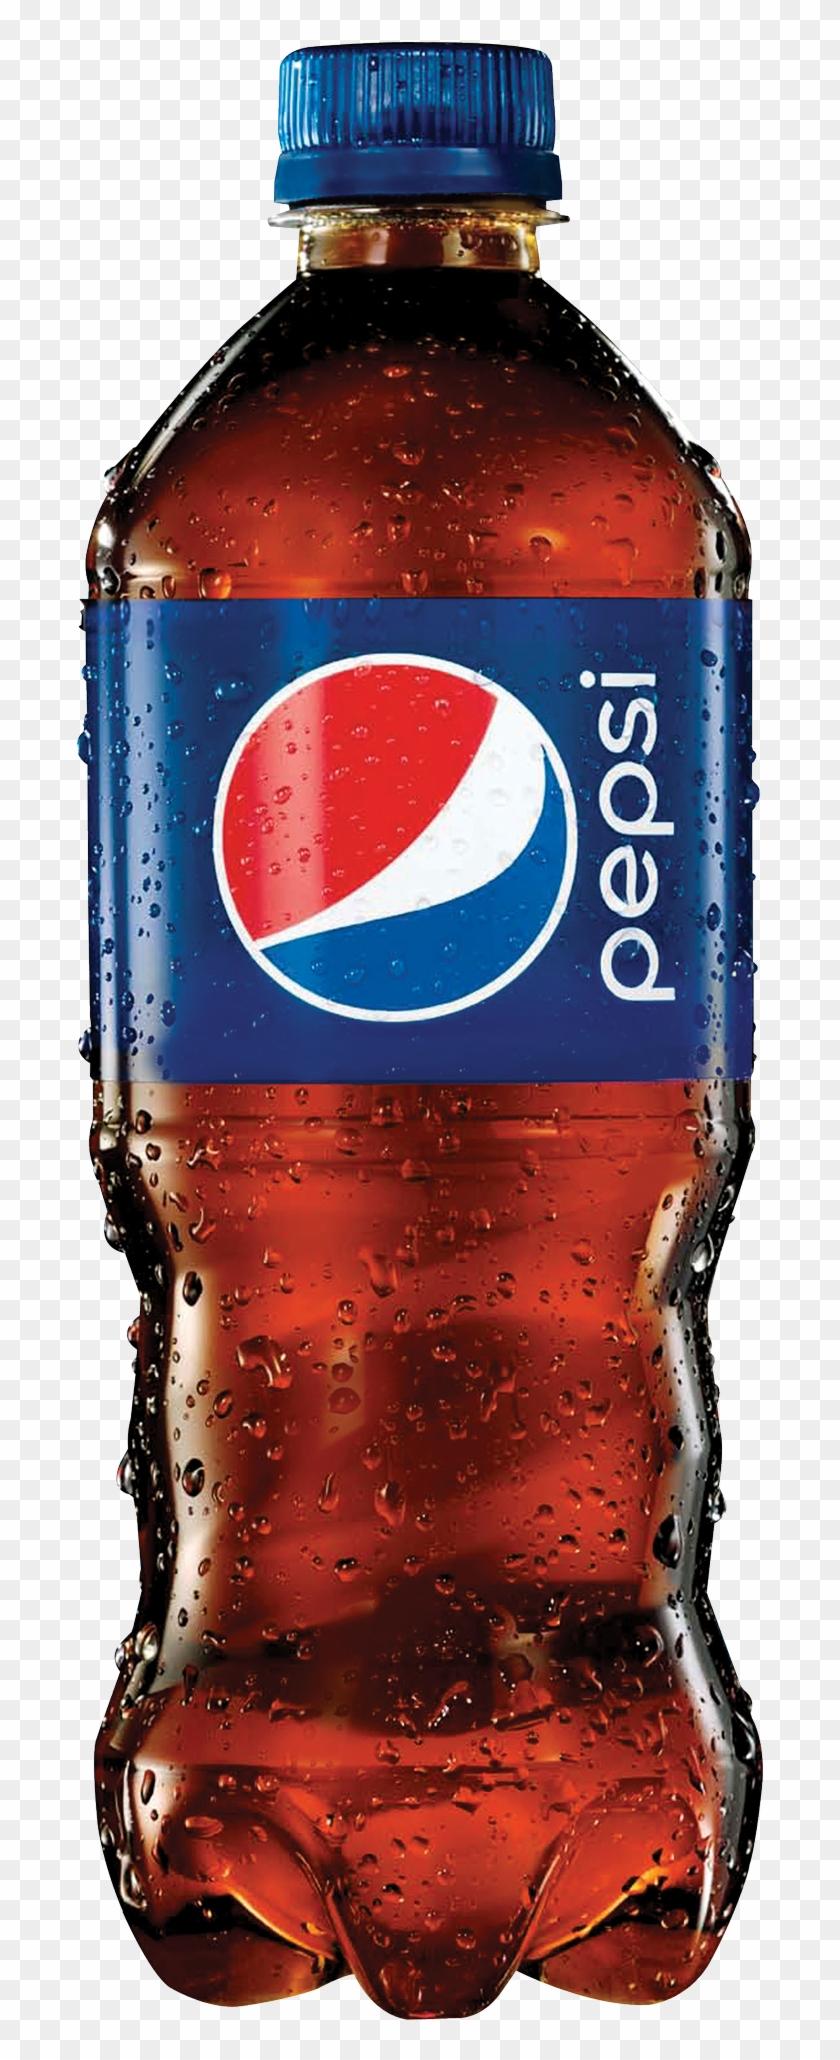 Pepsi Clipart Soda Water - Pepsi Bottle Transparent Background #1050559